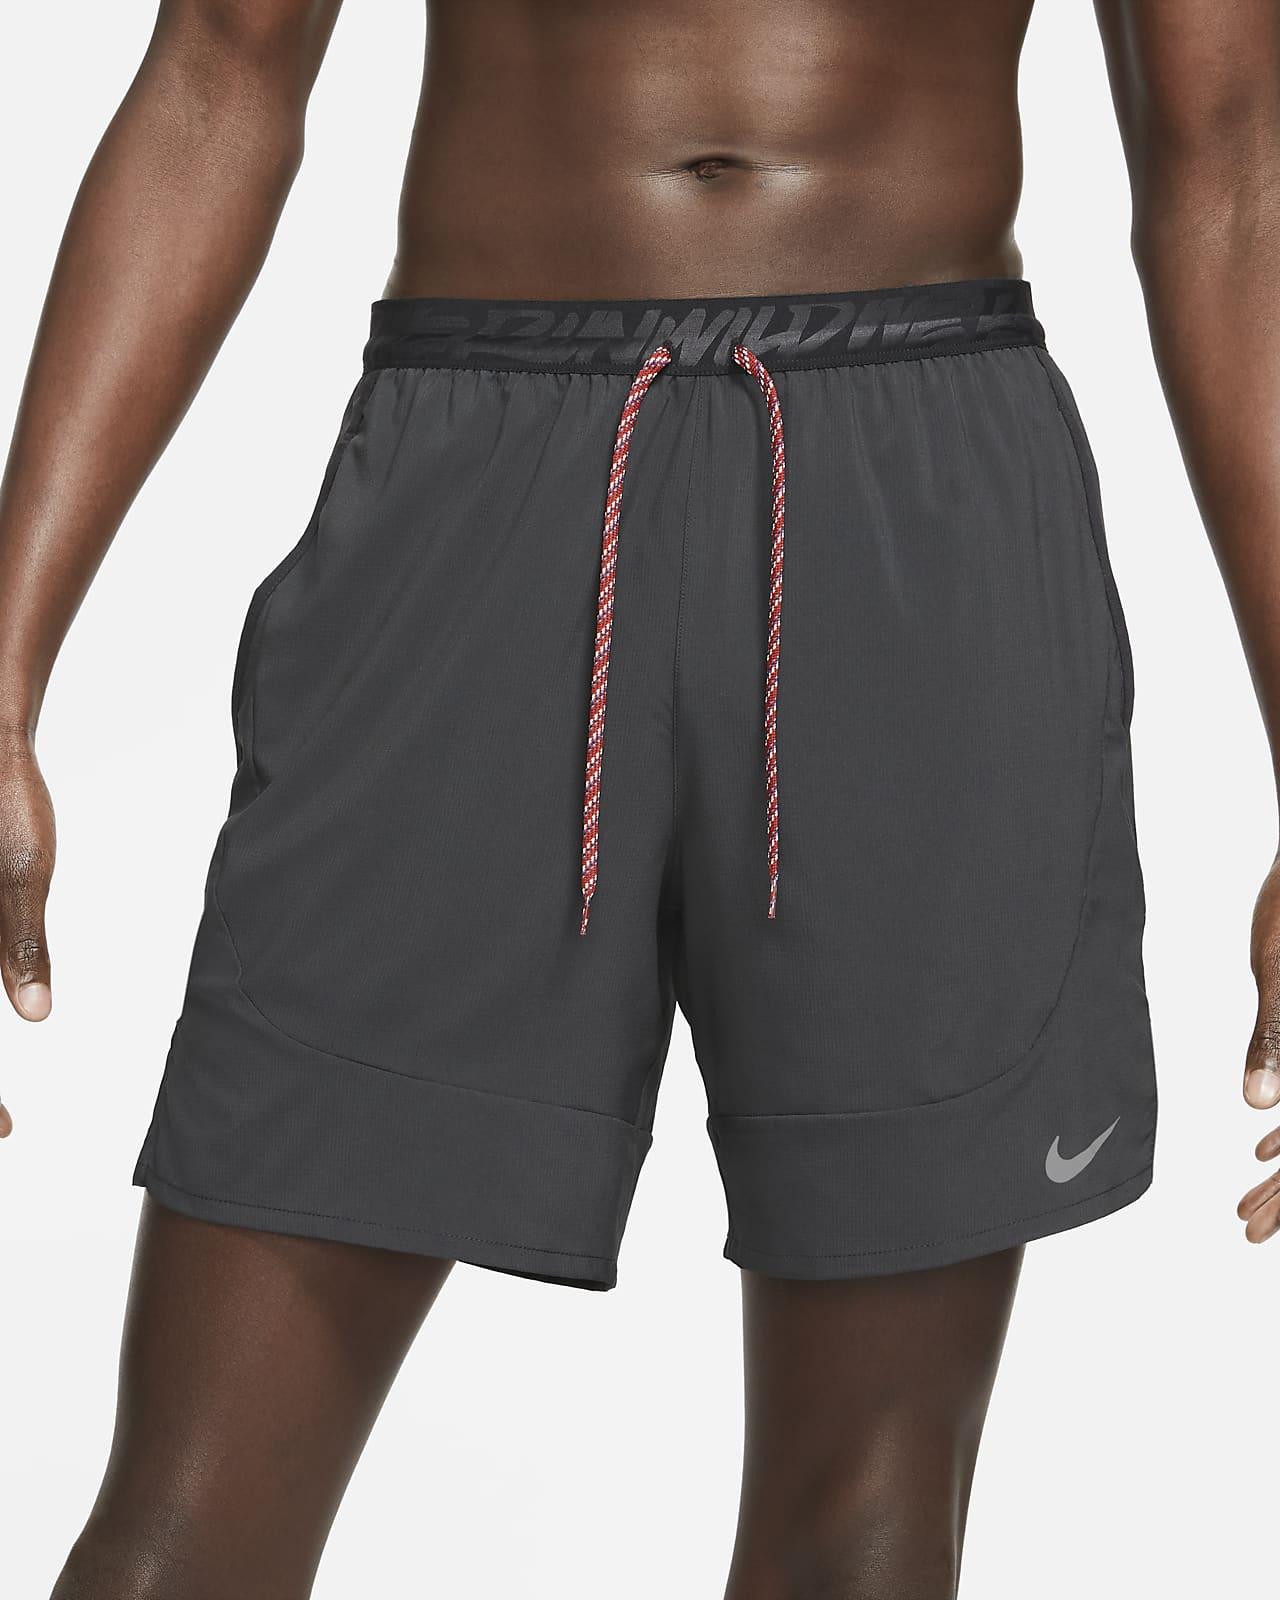 NEW Mens XS VIGA Pacer Running Split Leg Shorts Track Gym Fitness Sprint RUN.184